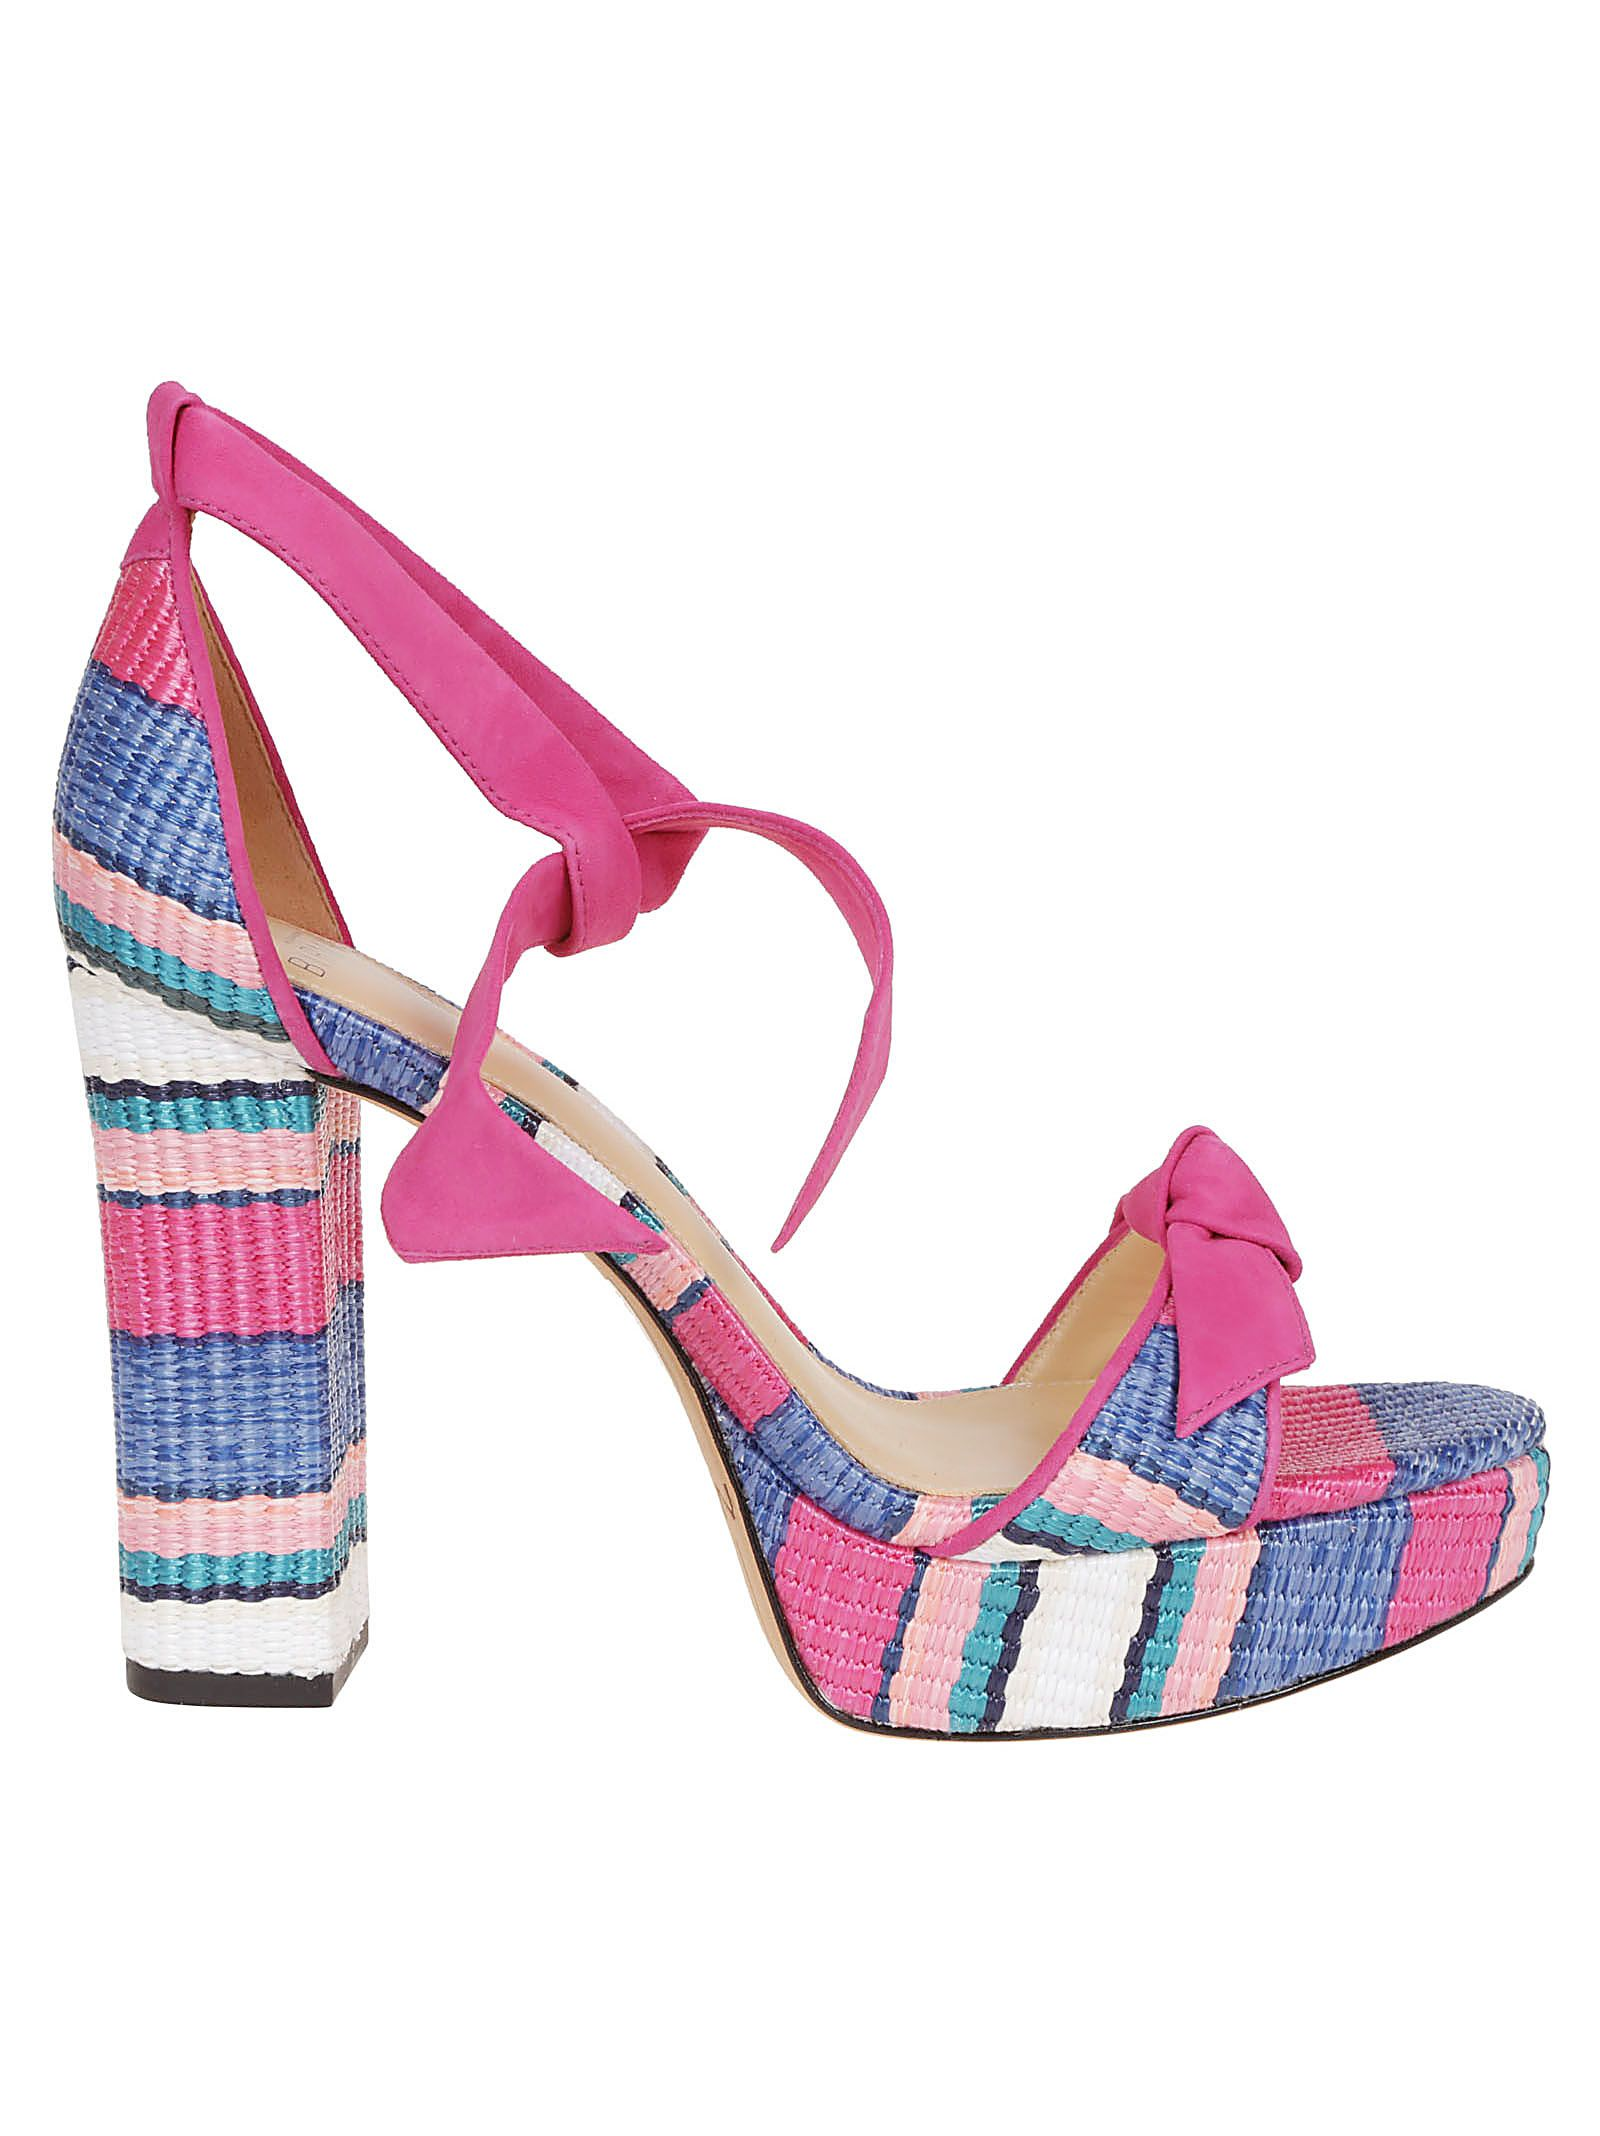 64122871e8 Alexandre Birman Alexandre Birman New Clarita Platform Sandals - 10827257 |  italist